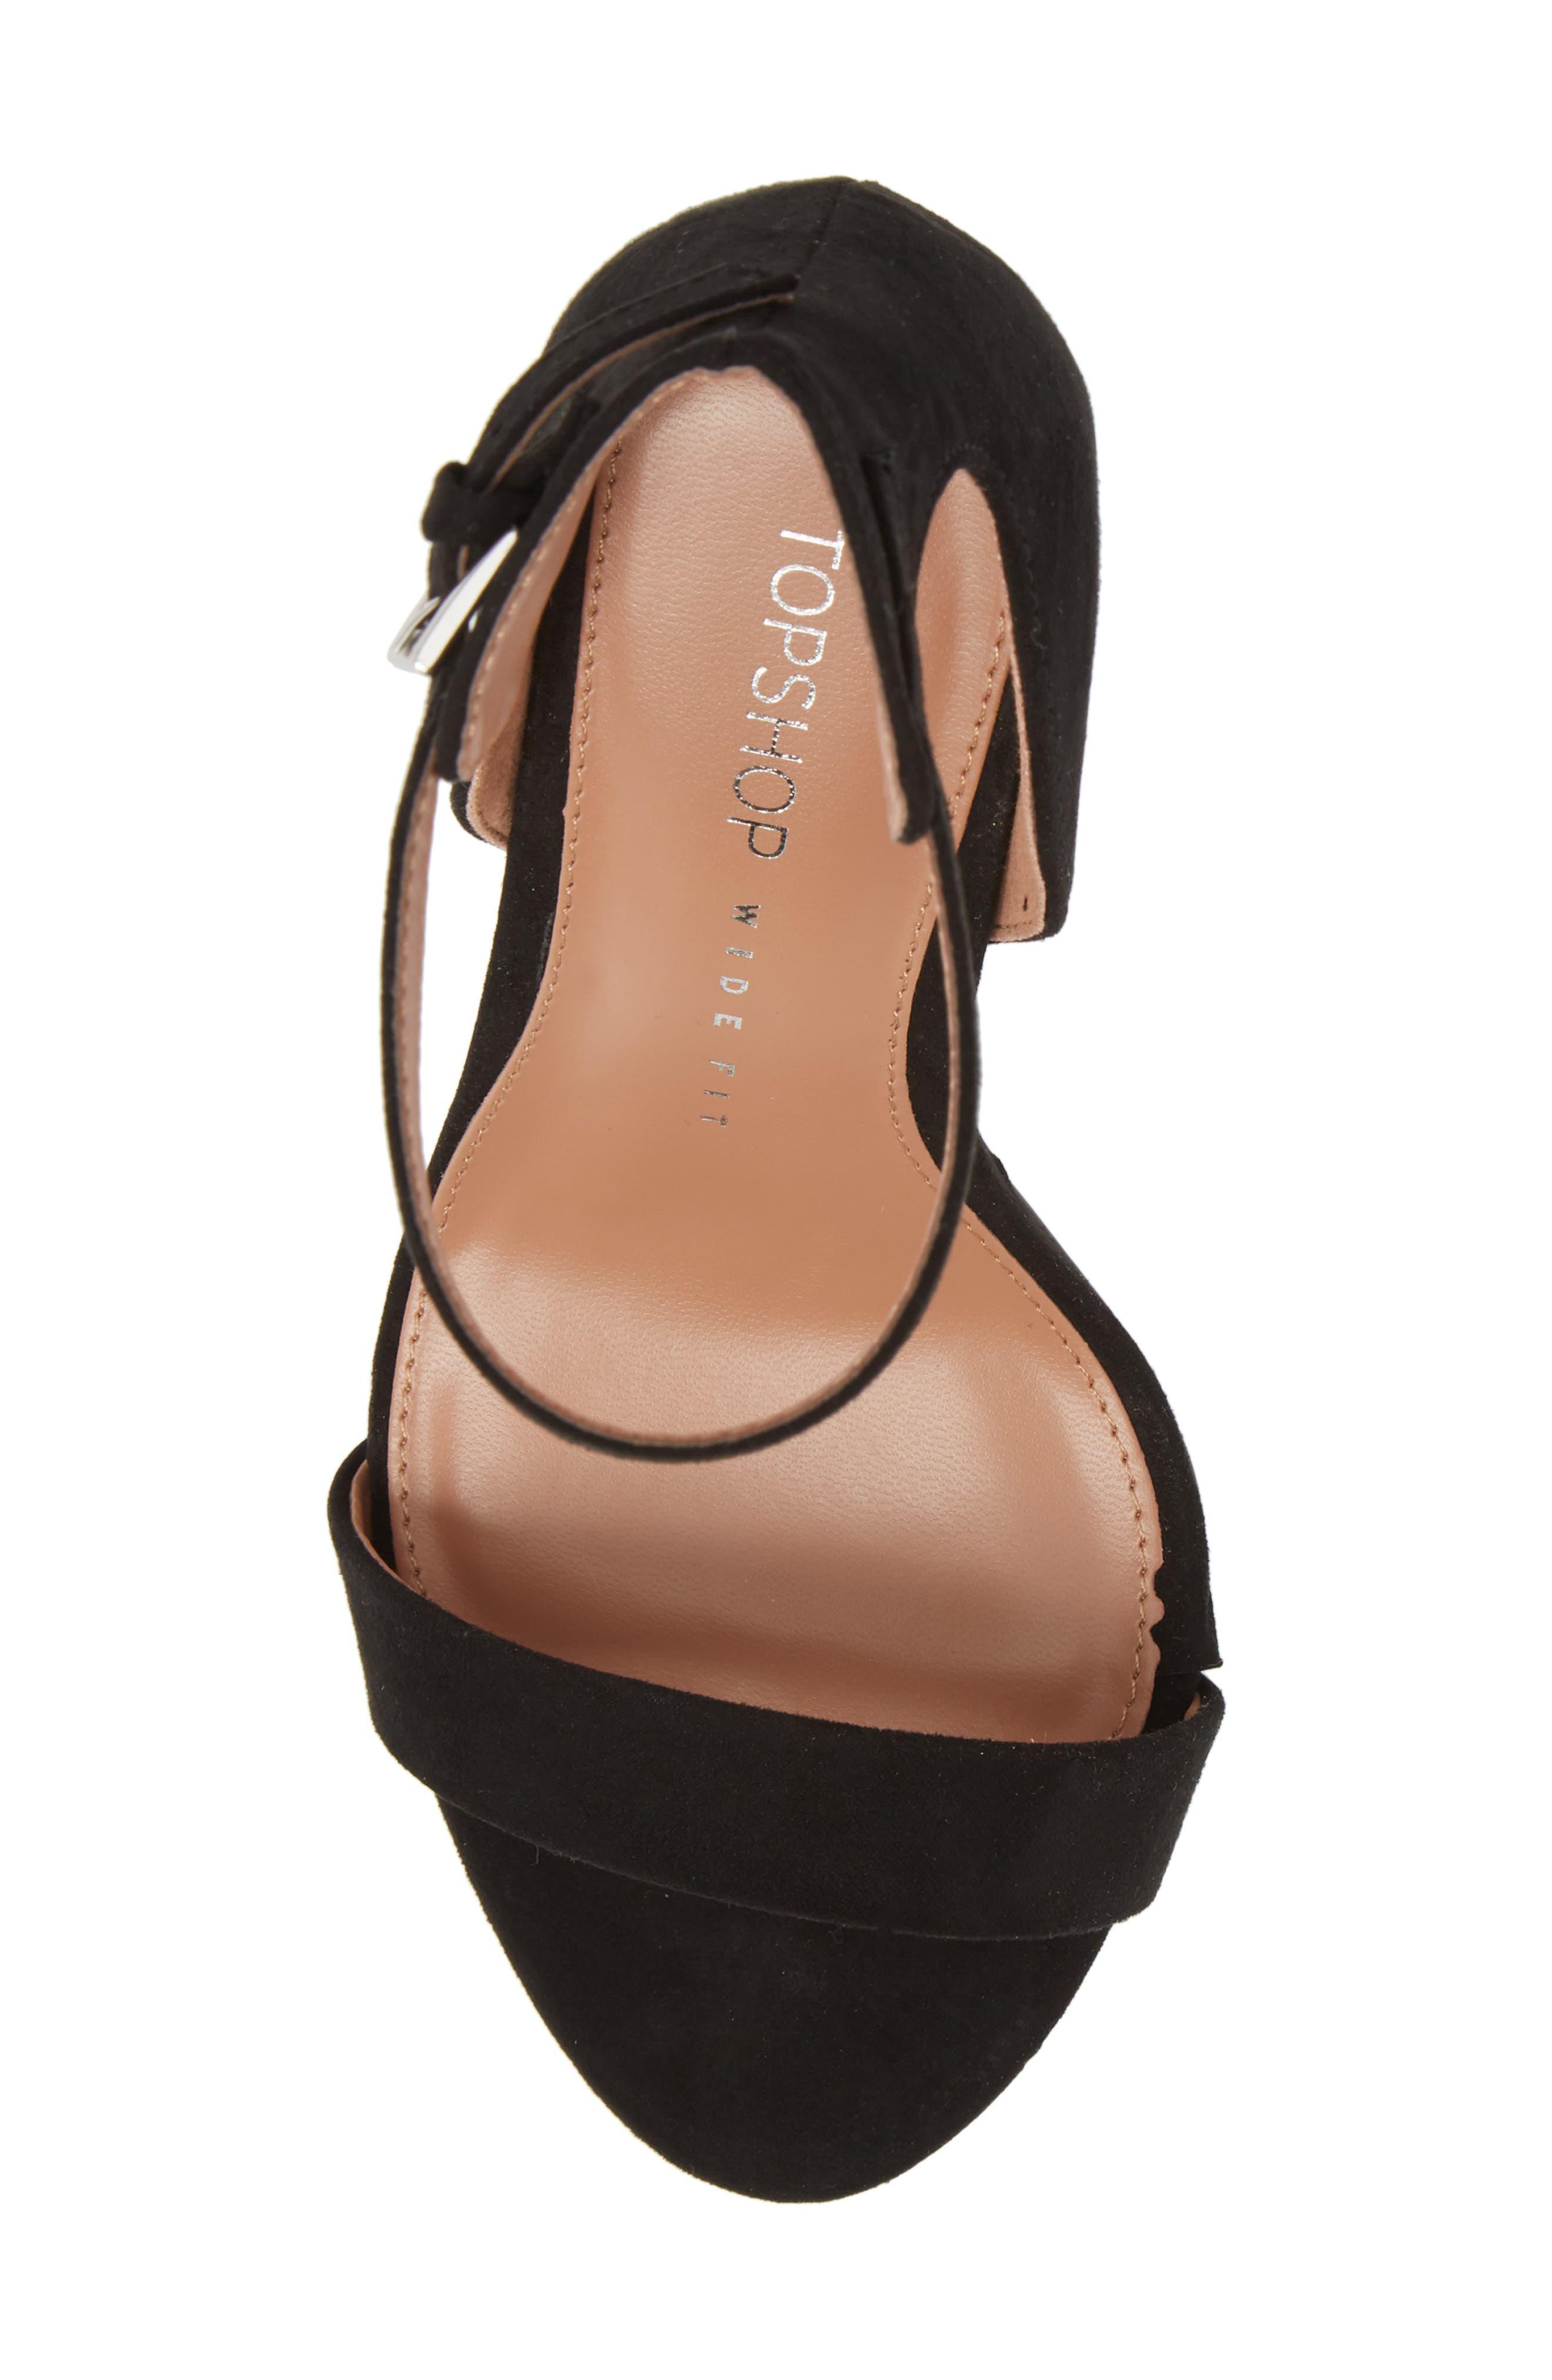 Marcelle Ankle Strap Sandal,                             Alternate thumbnail 5, color,                             Black